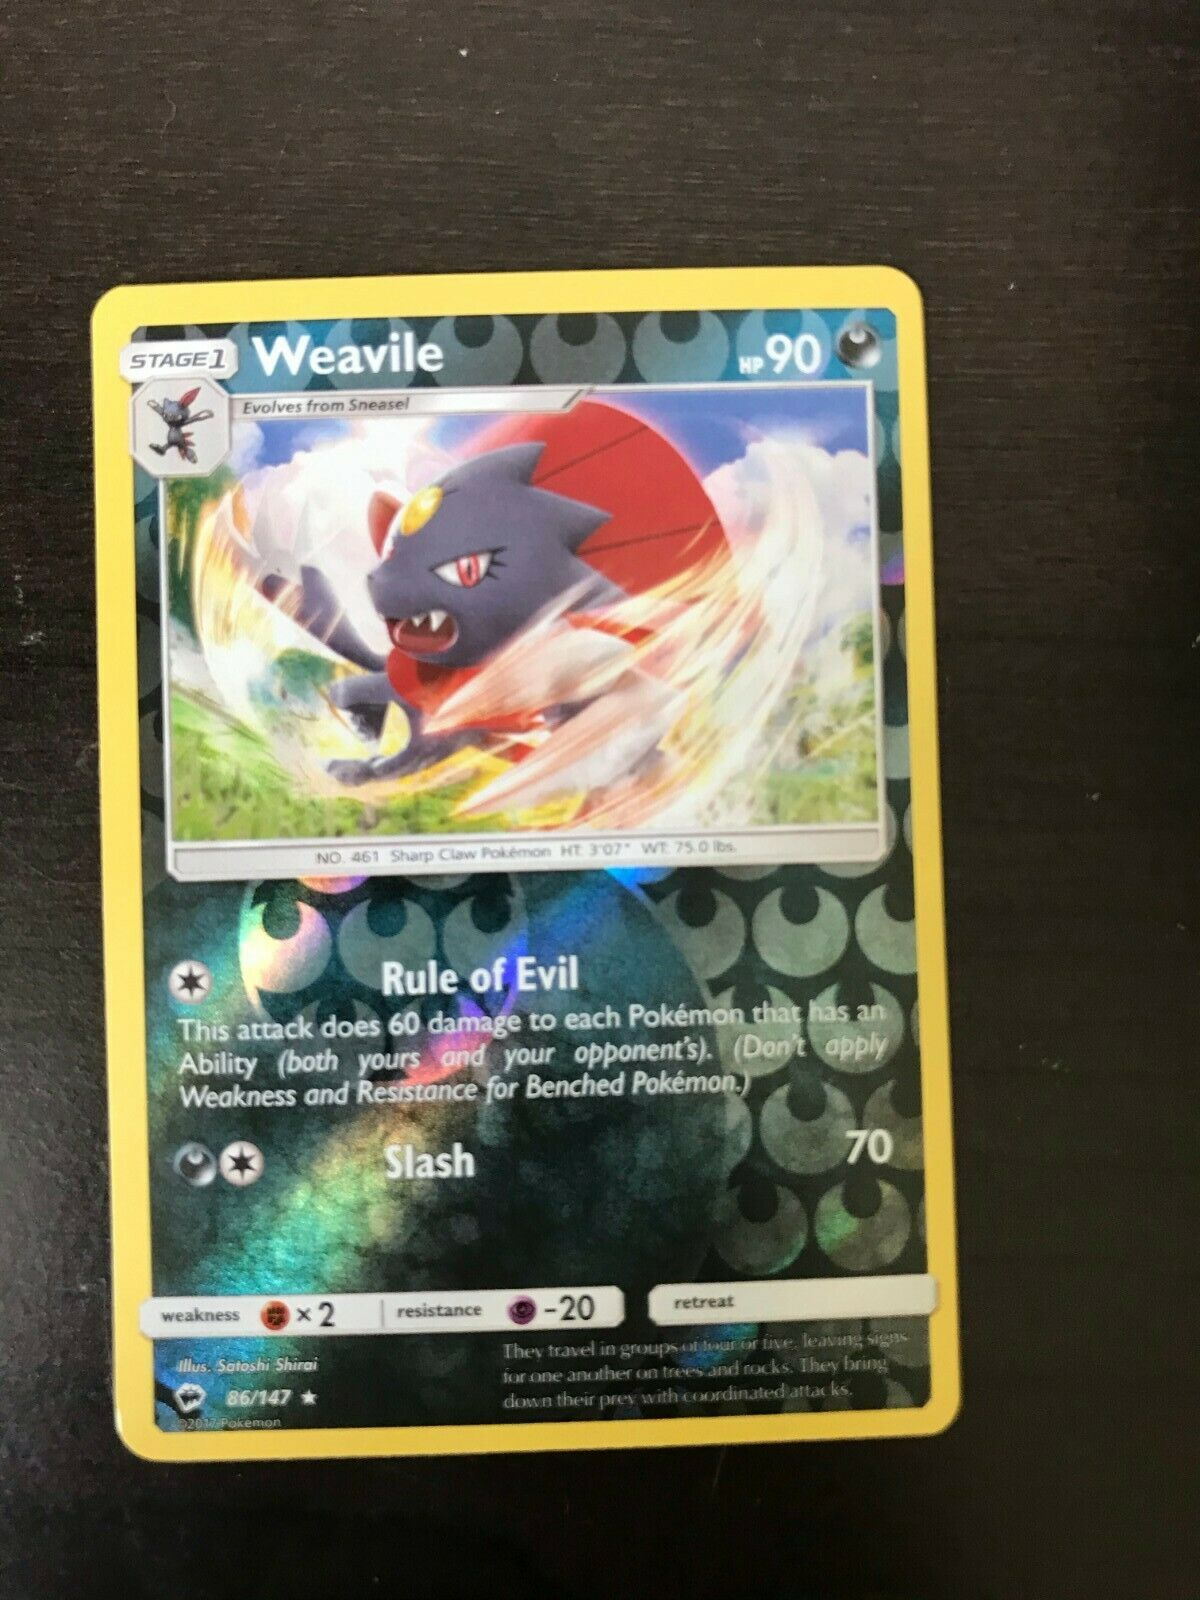 Weavile Pokemon Card 2017 86/147 Rare Reverse Holo Burning shadows